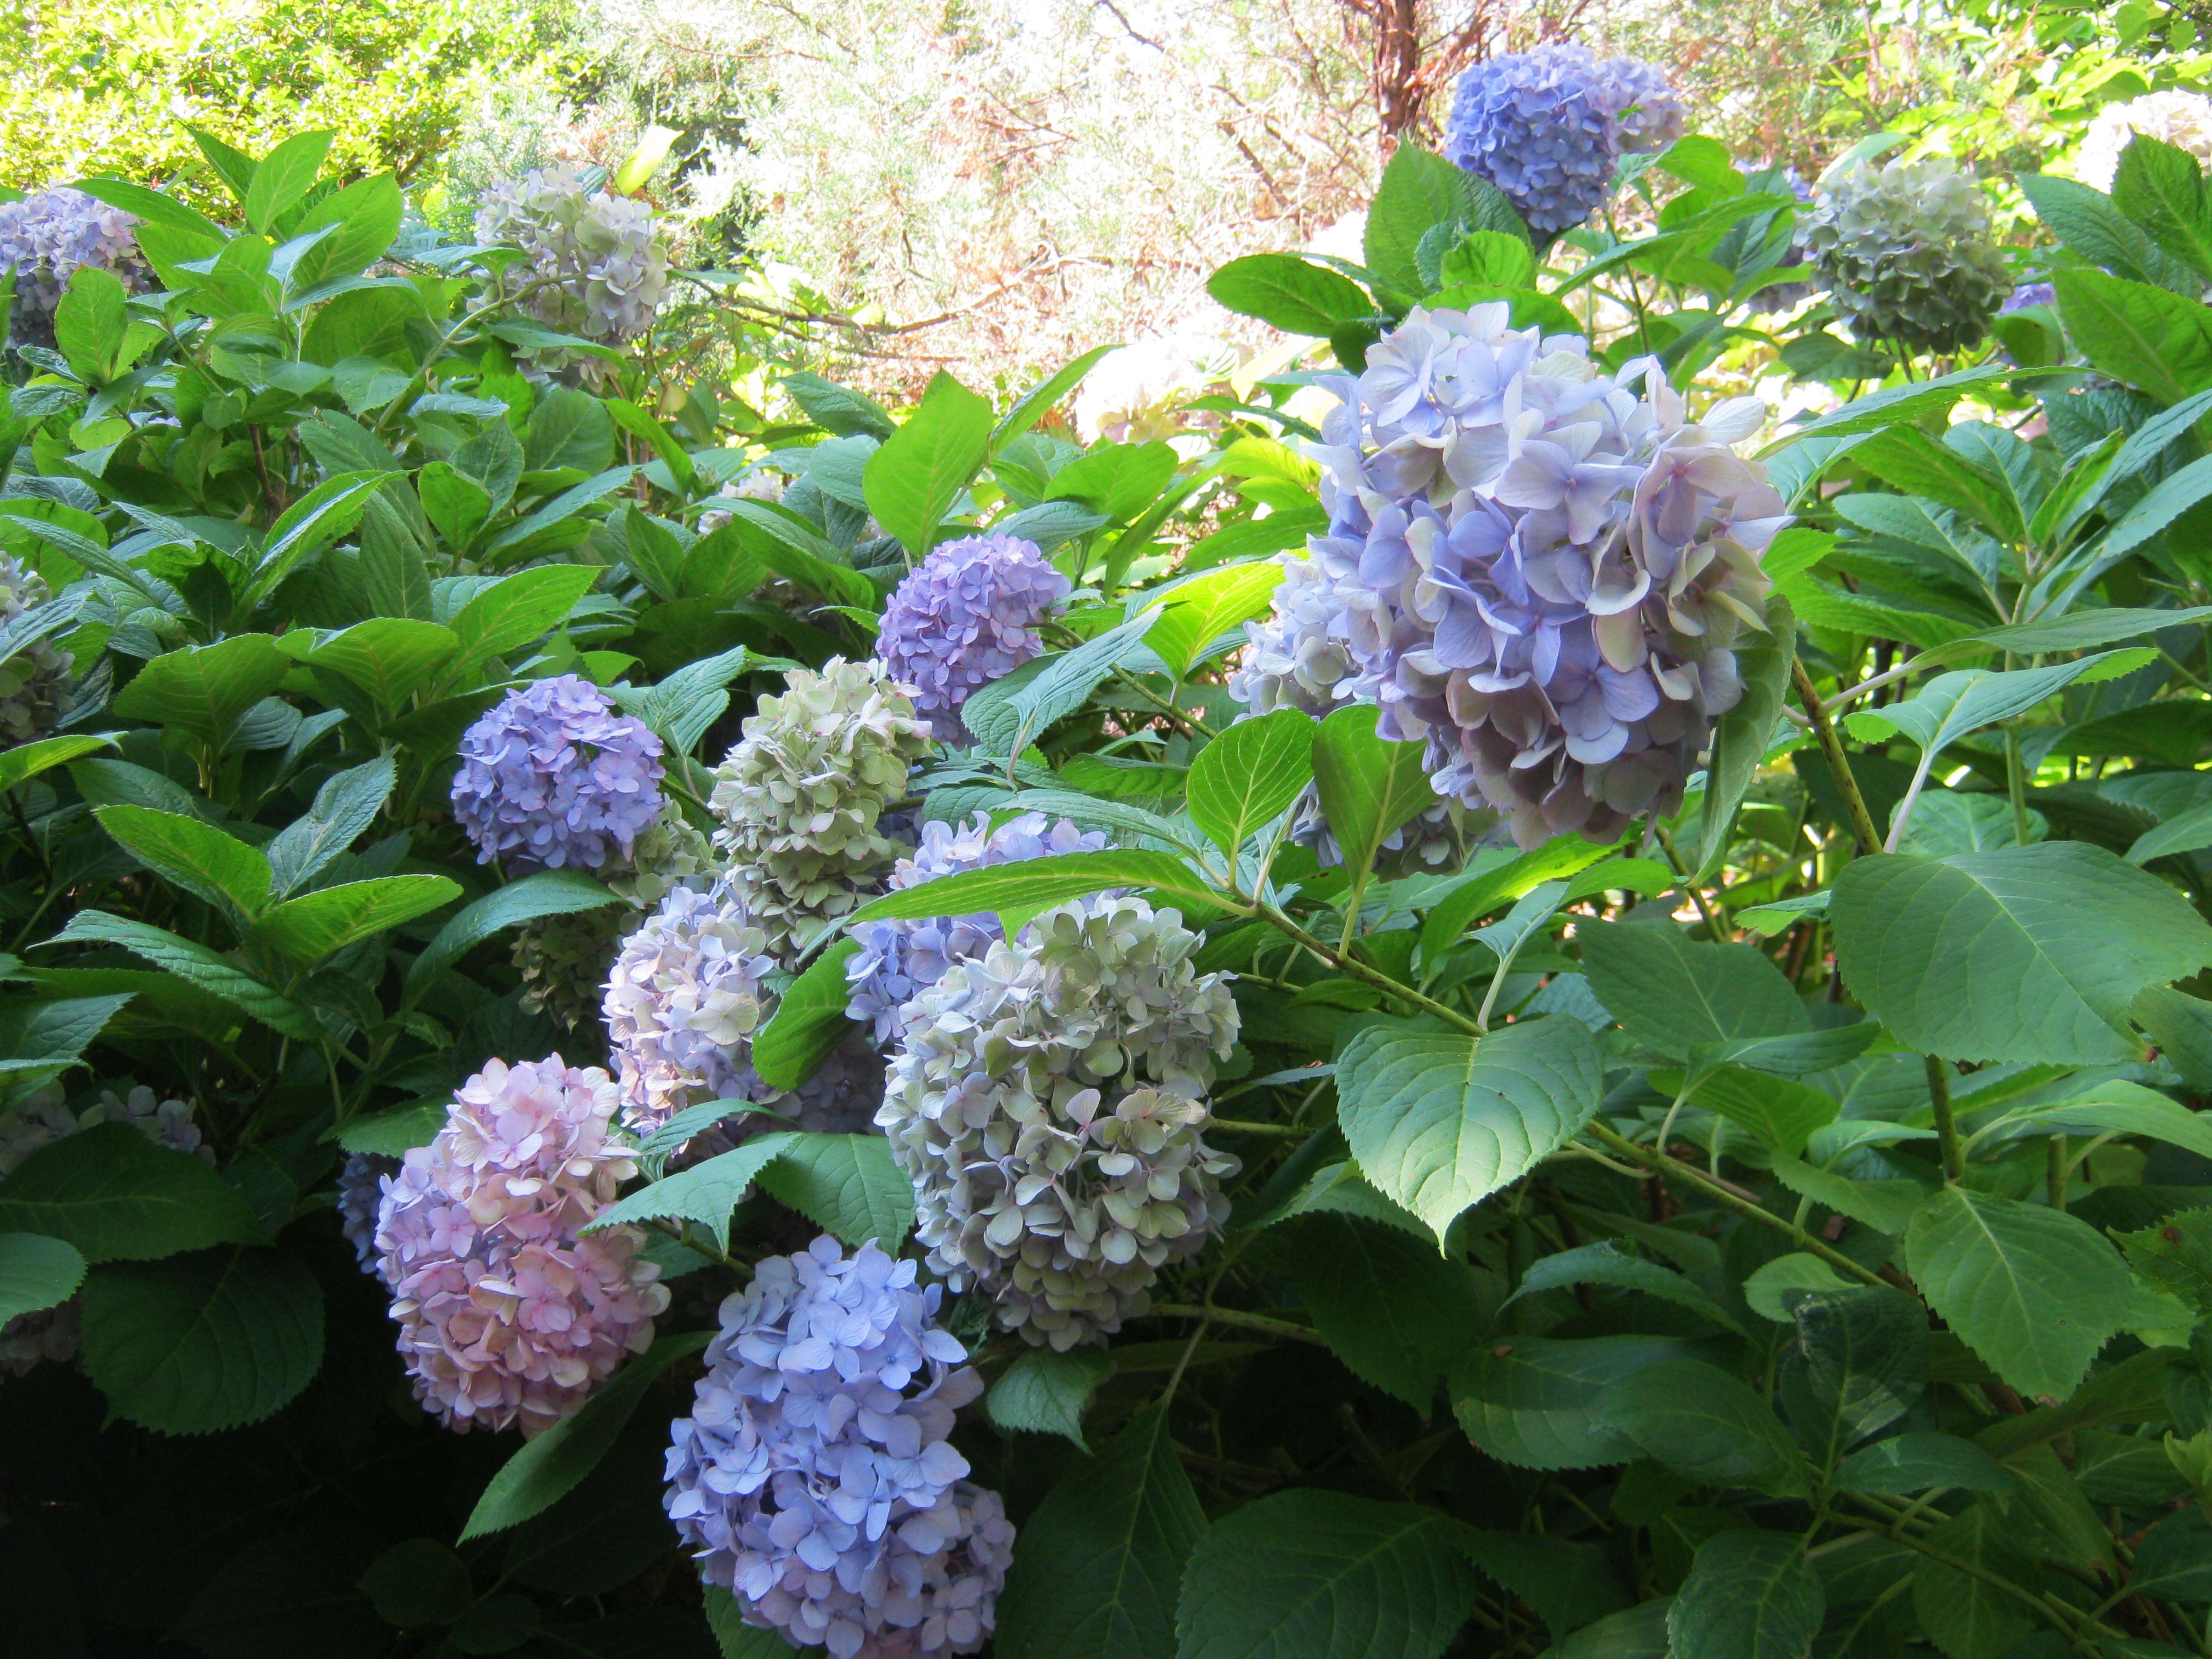 Heavenly Hydrangeas Highlights Of The Summer Garden